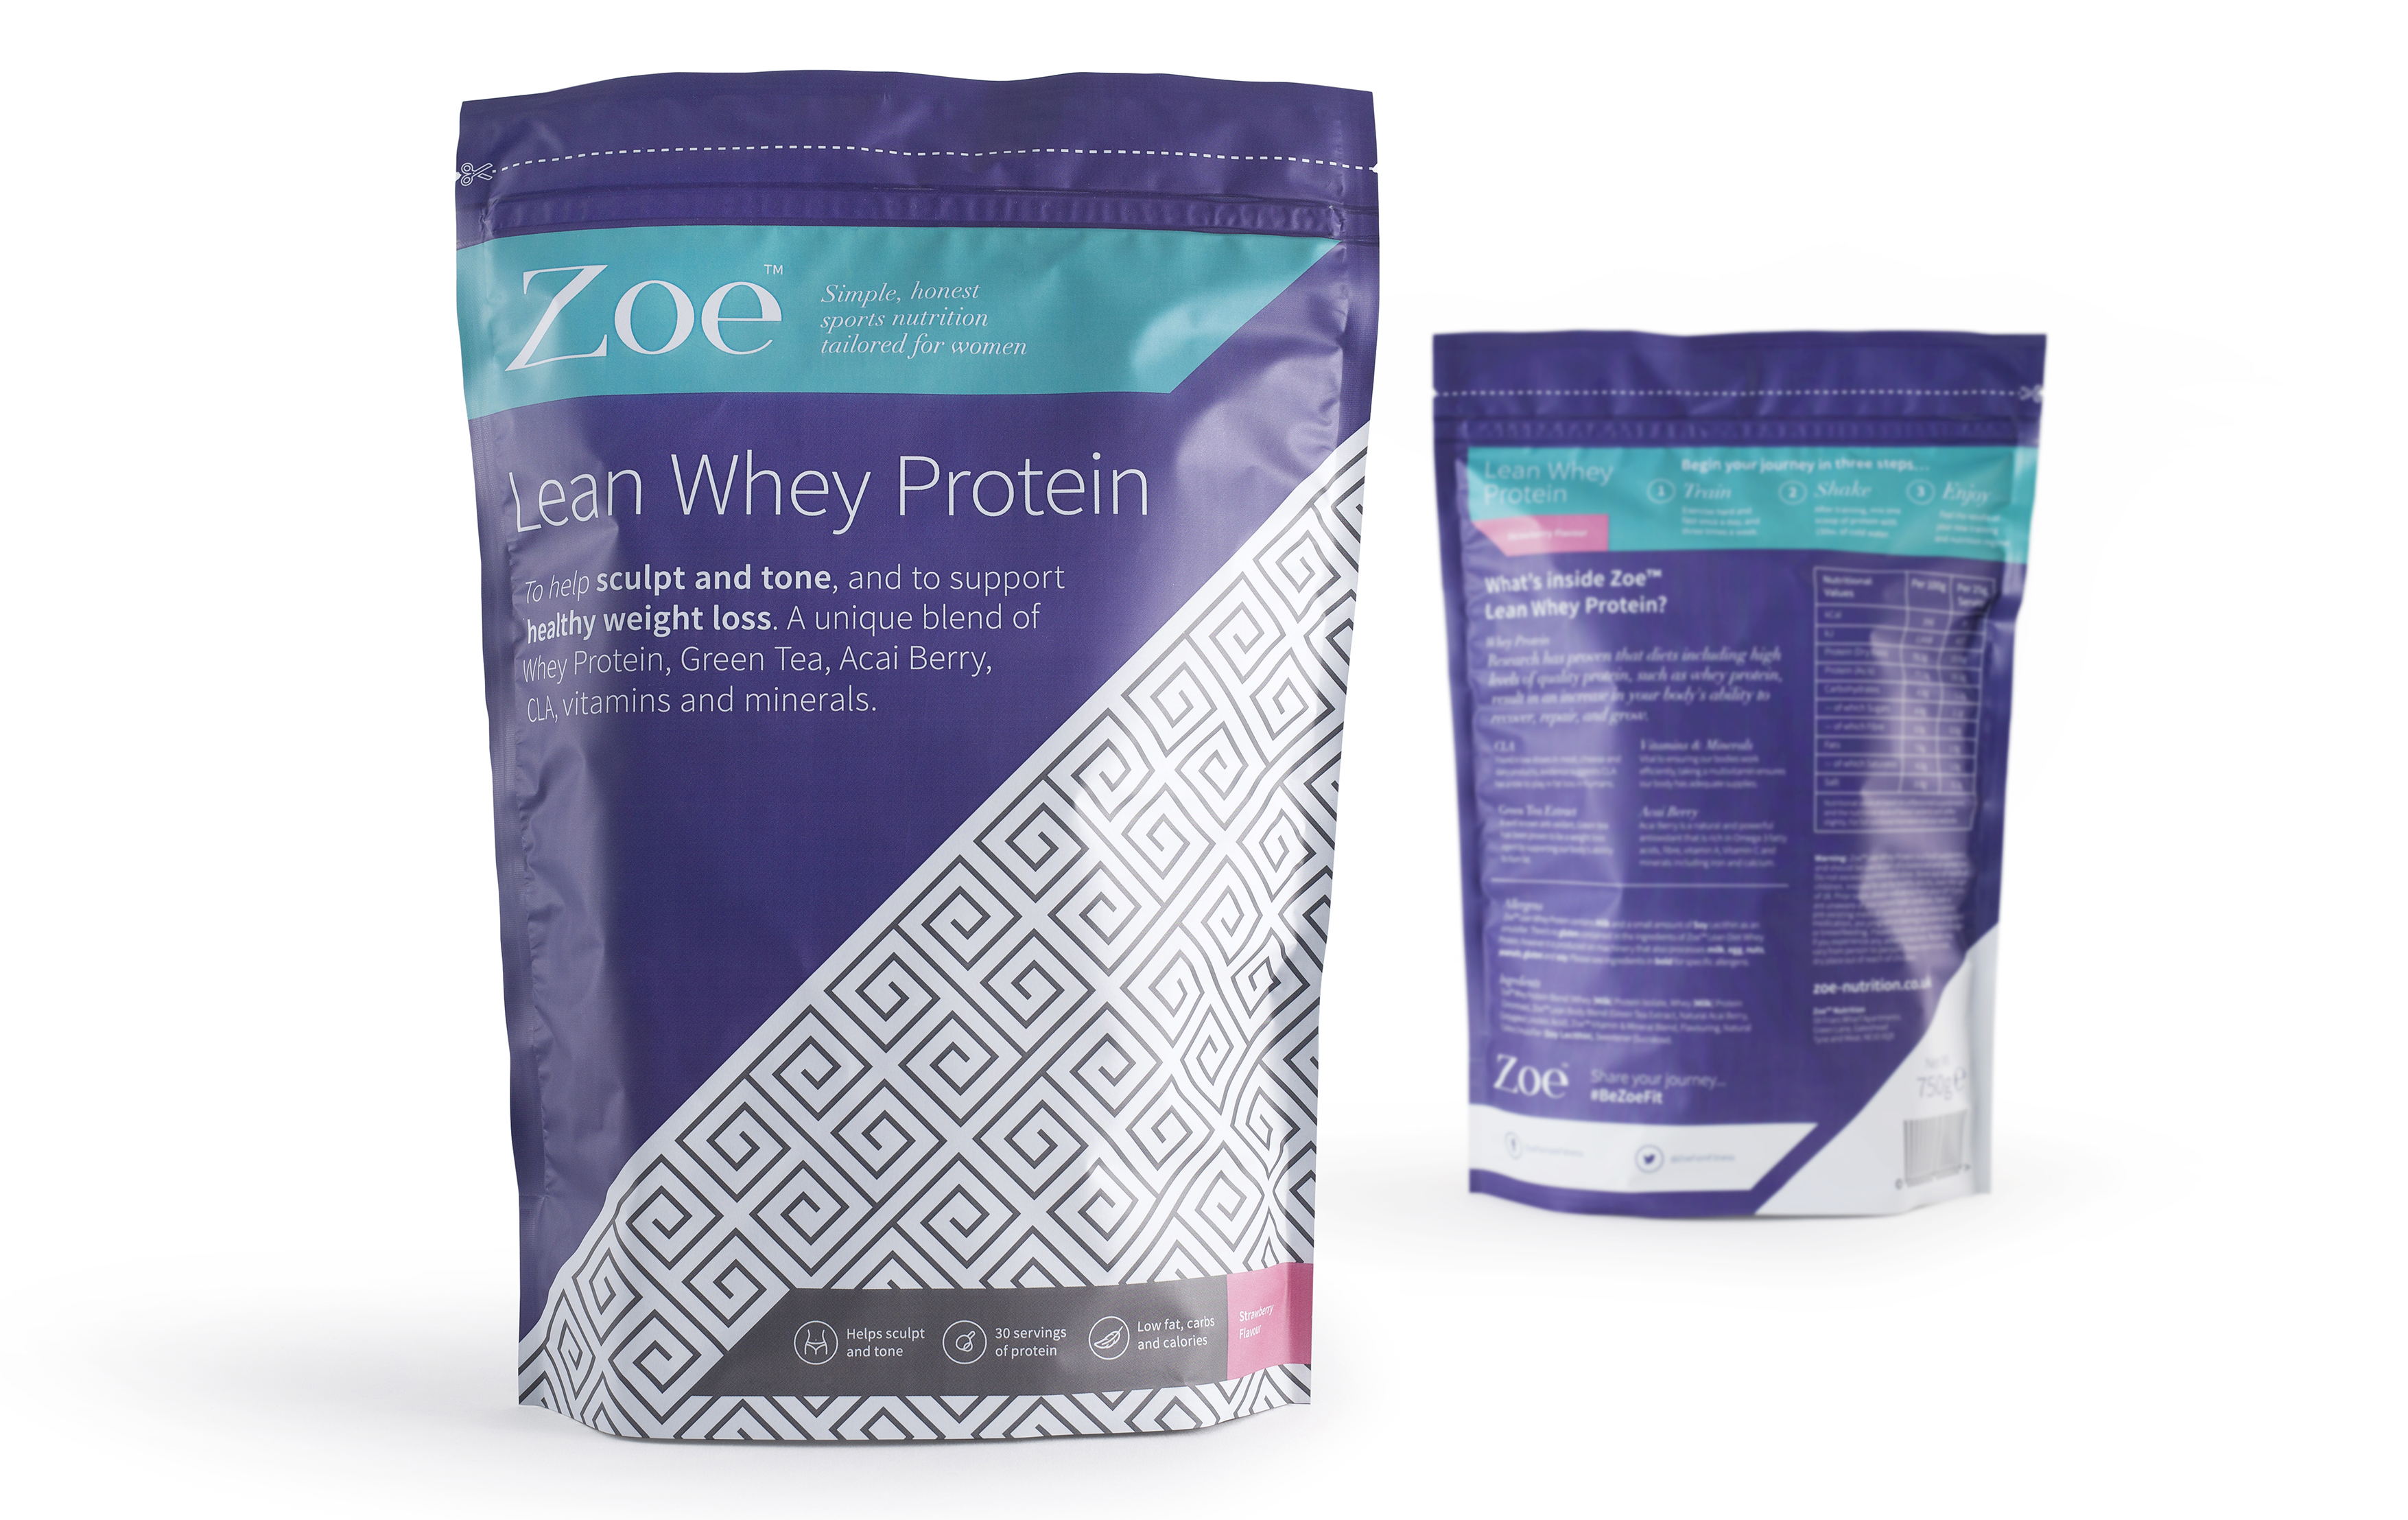 Zoe Protein Packaging Design